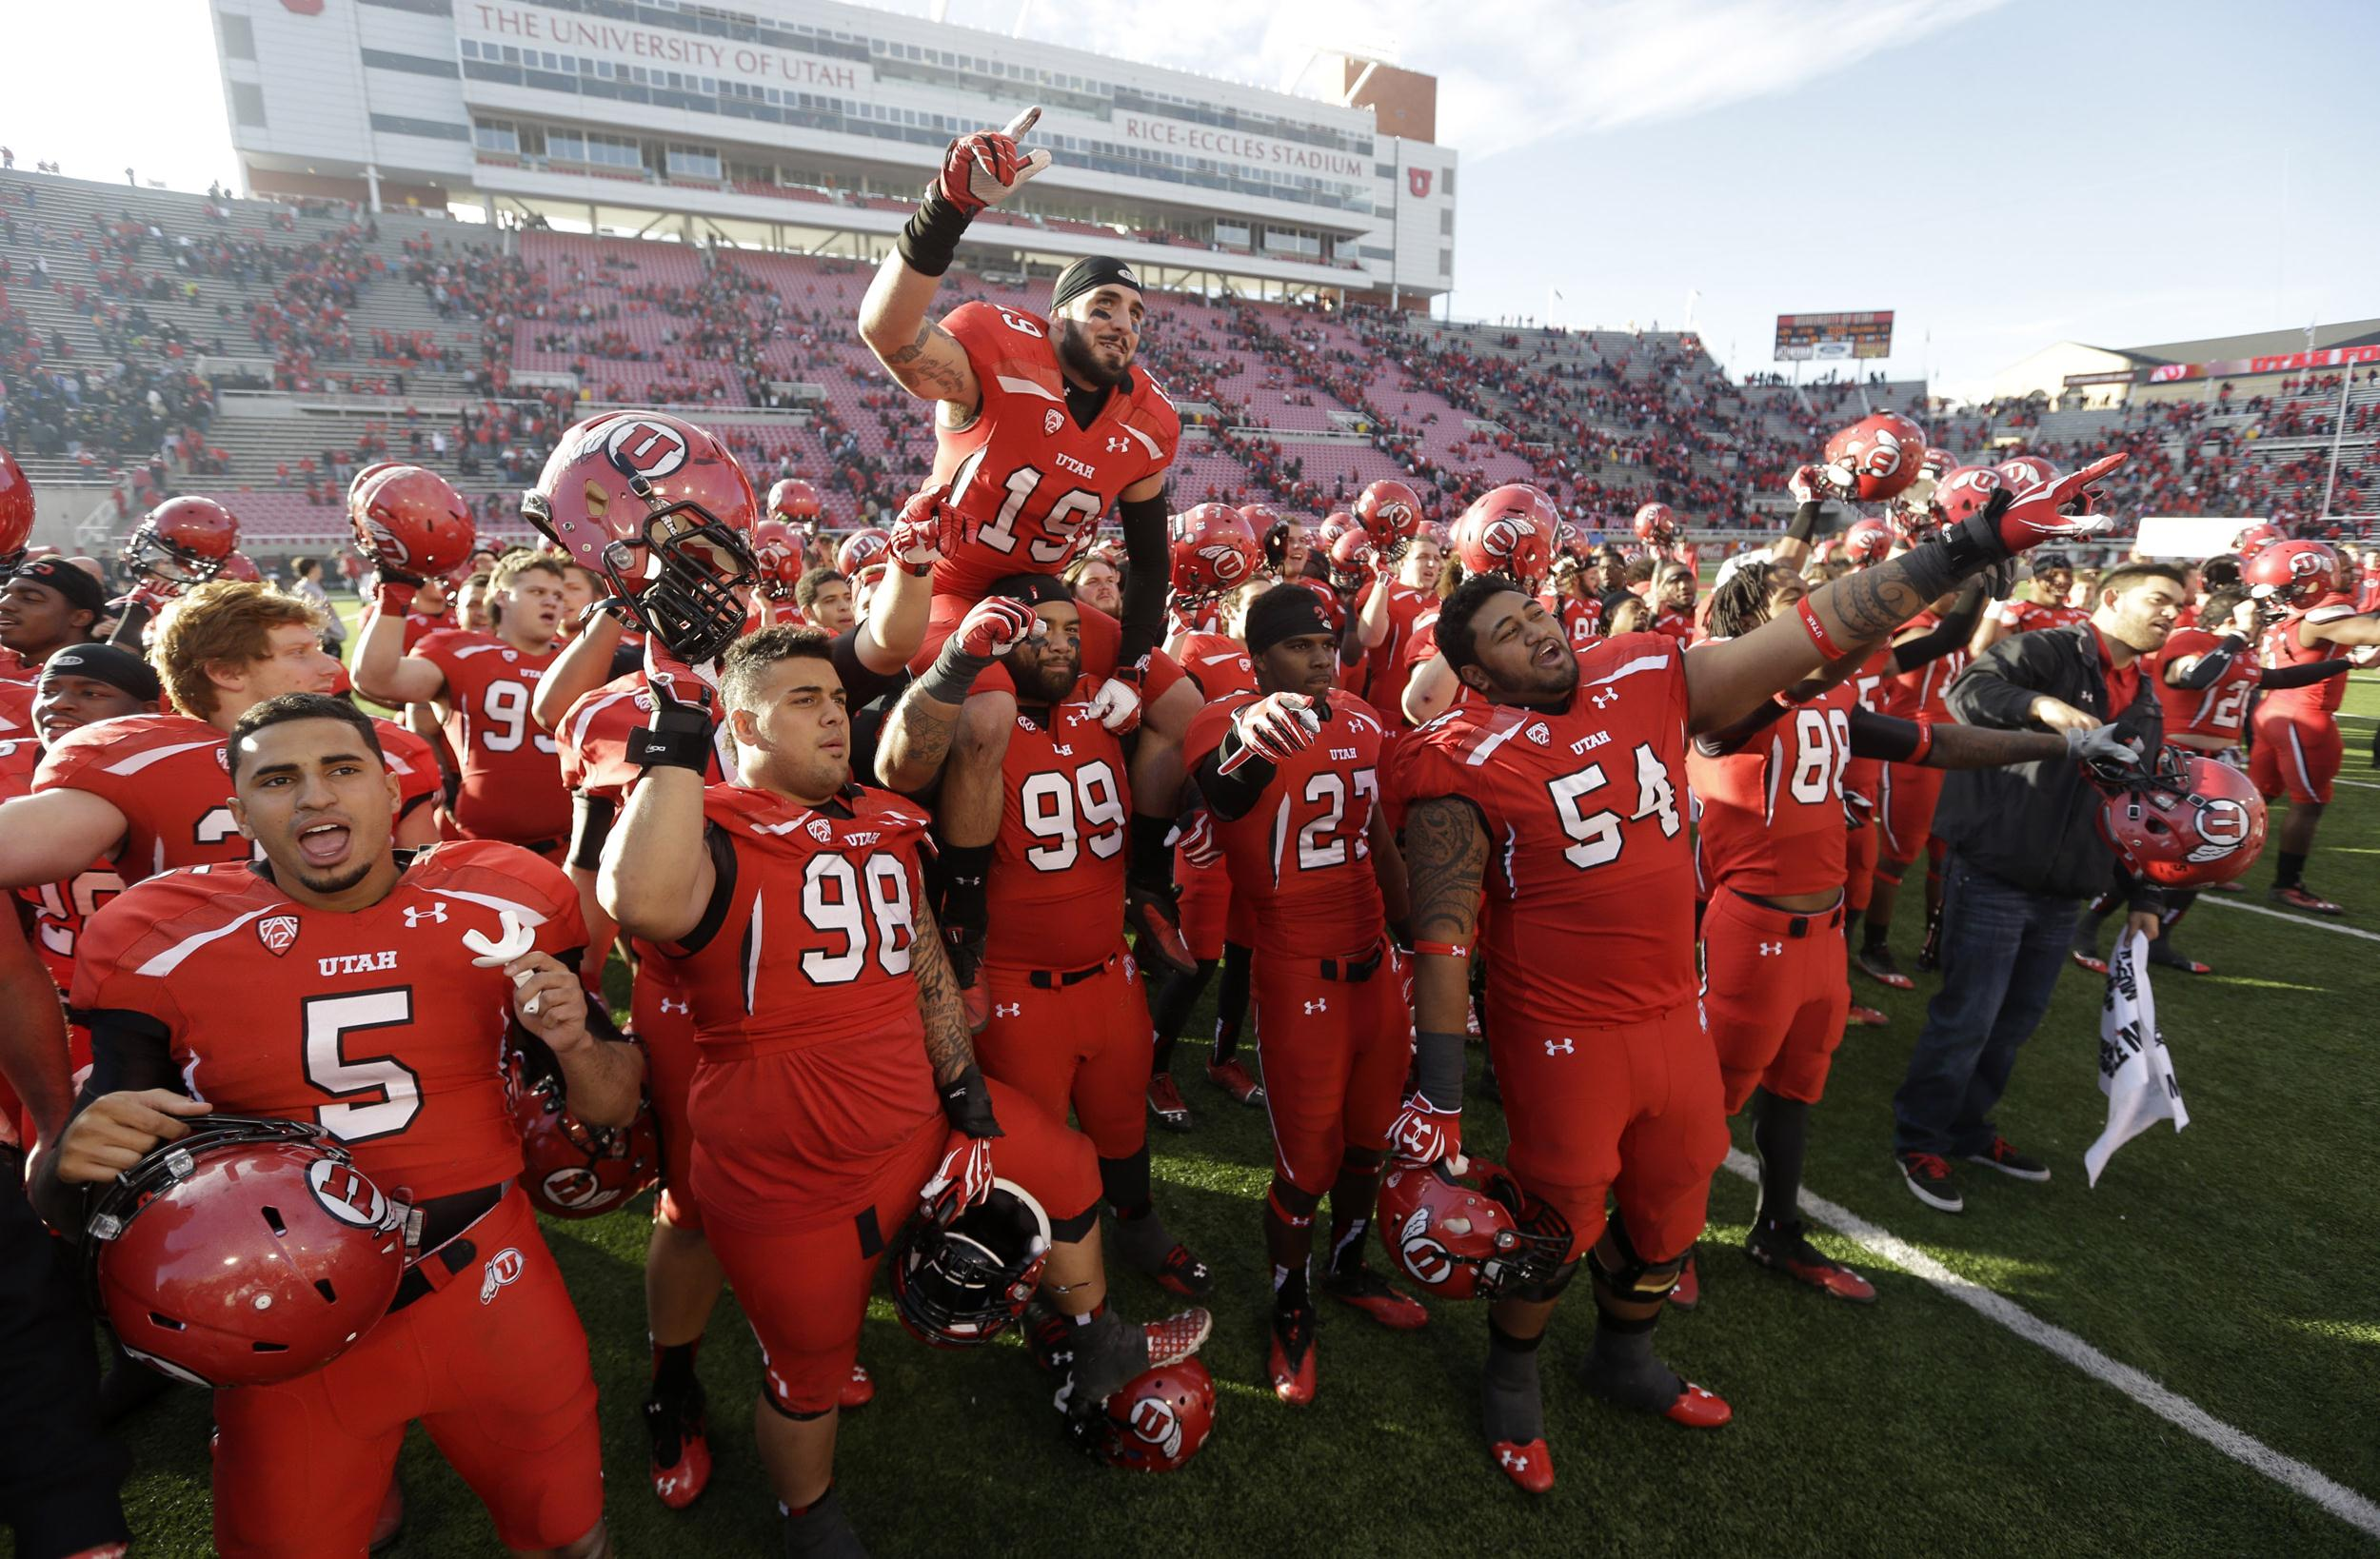 Image: Utah players celebrate after game against Colorado on Nov. 30